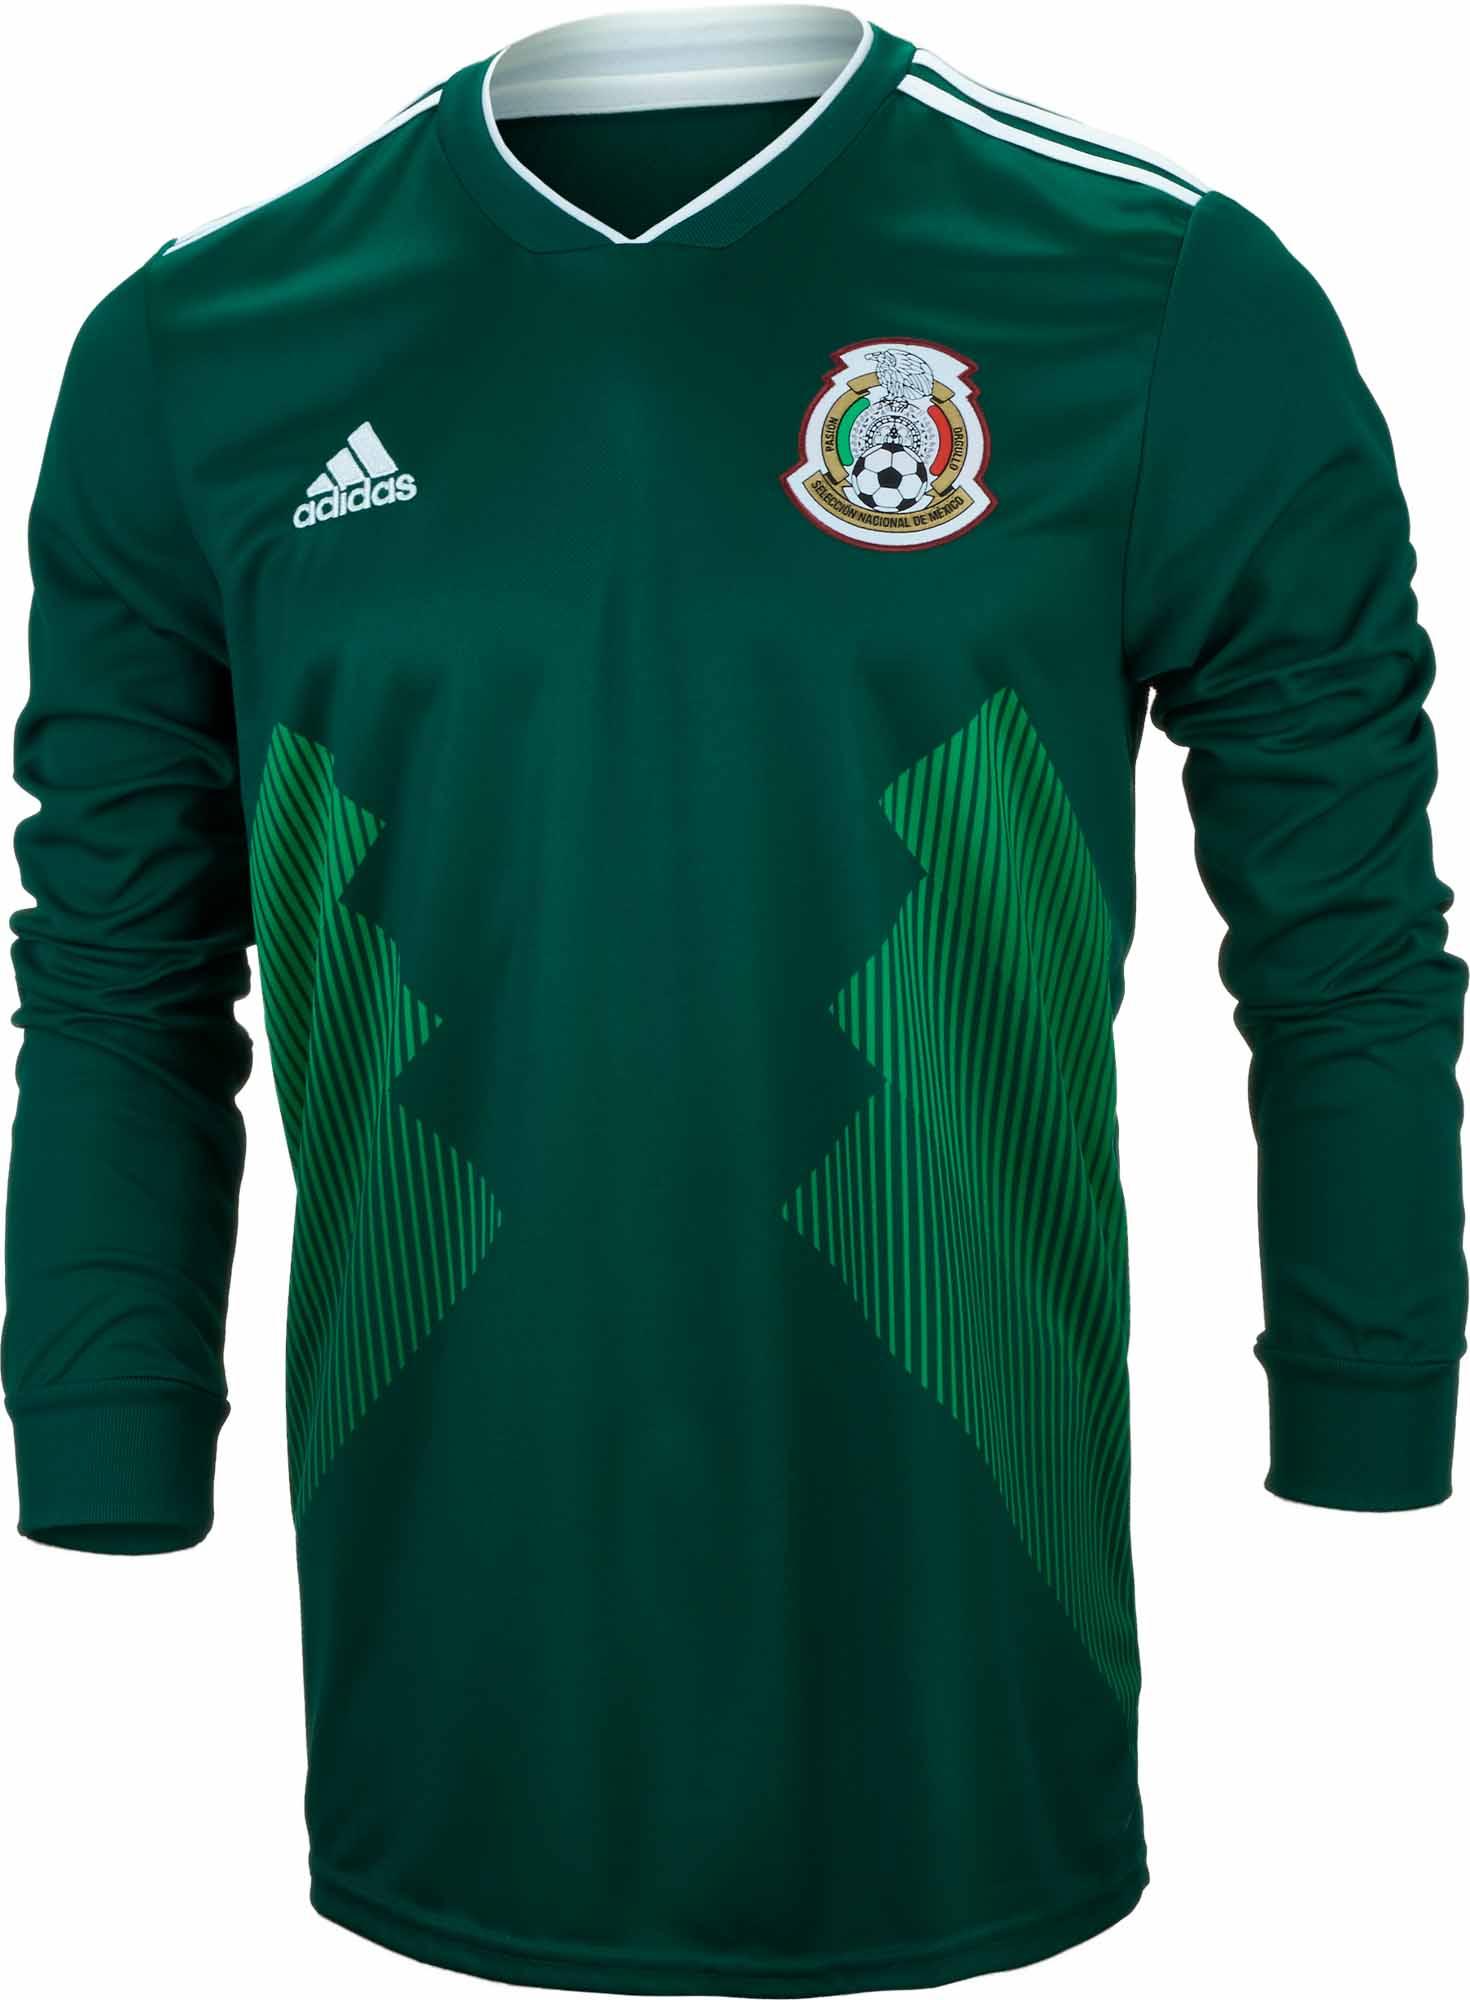 e04c03f5f88 adidas Mexico L S Home Jersey 2018-19 NS - Soccer Master